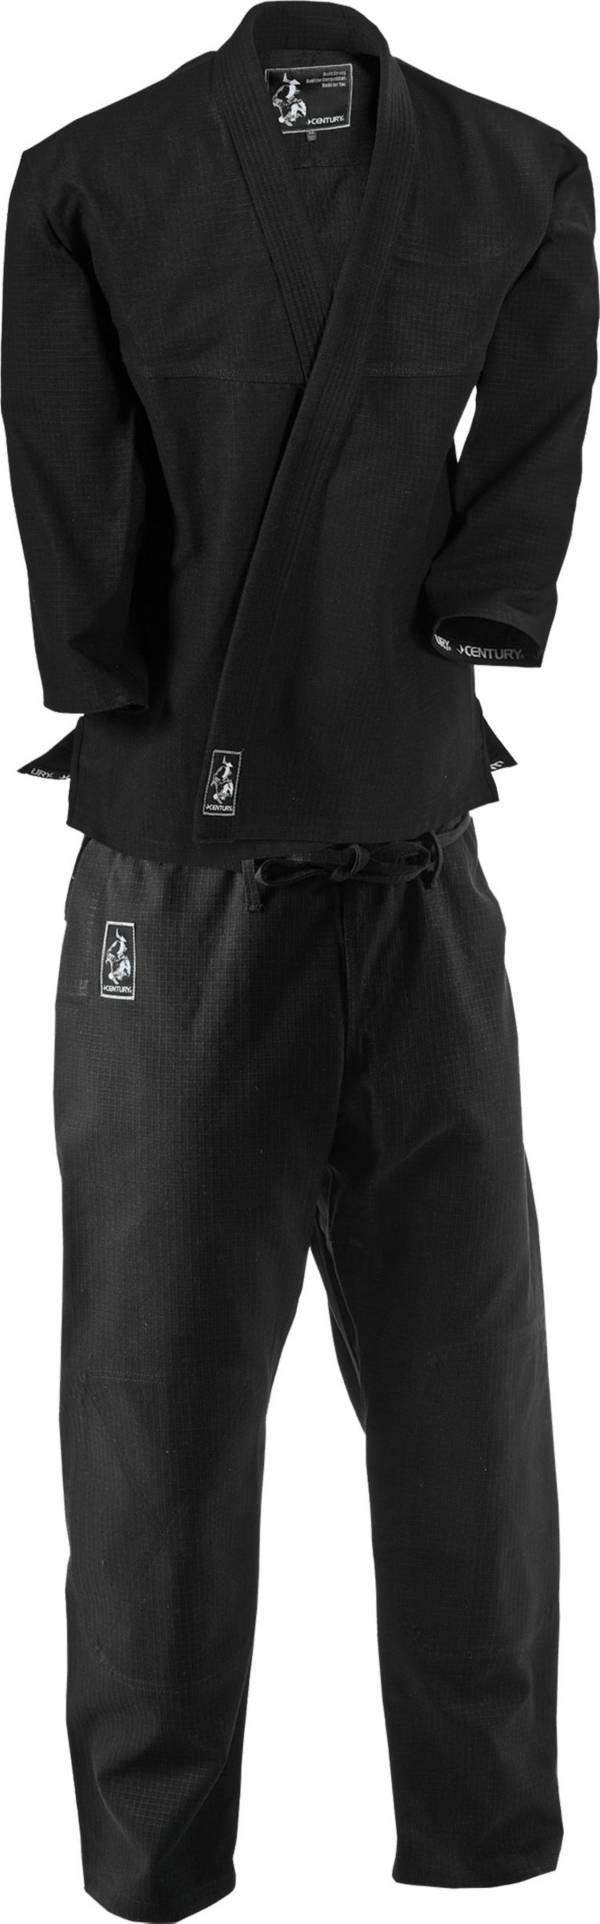 Century Adult RipStop 420 Brazilian Jiu-Jitsu Uniform product image